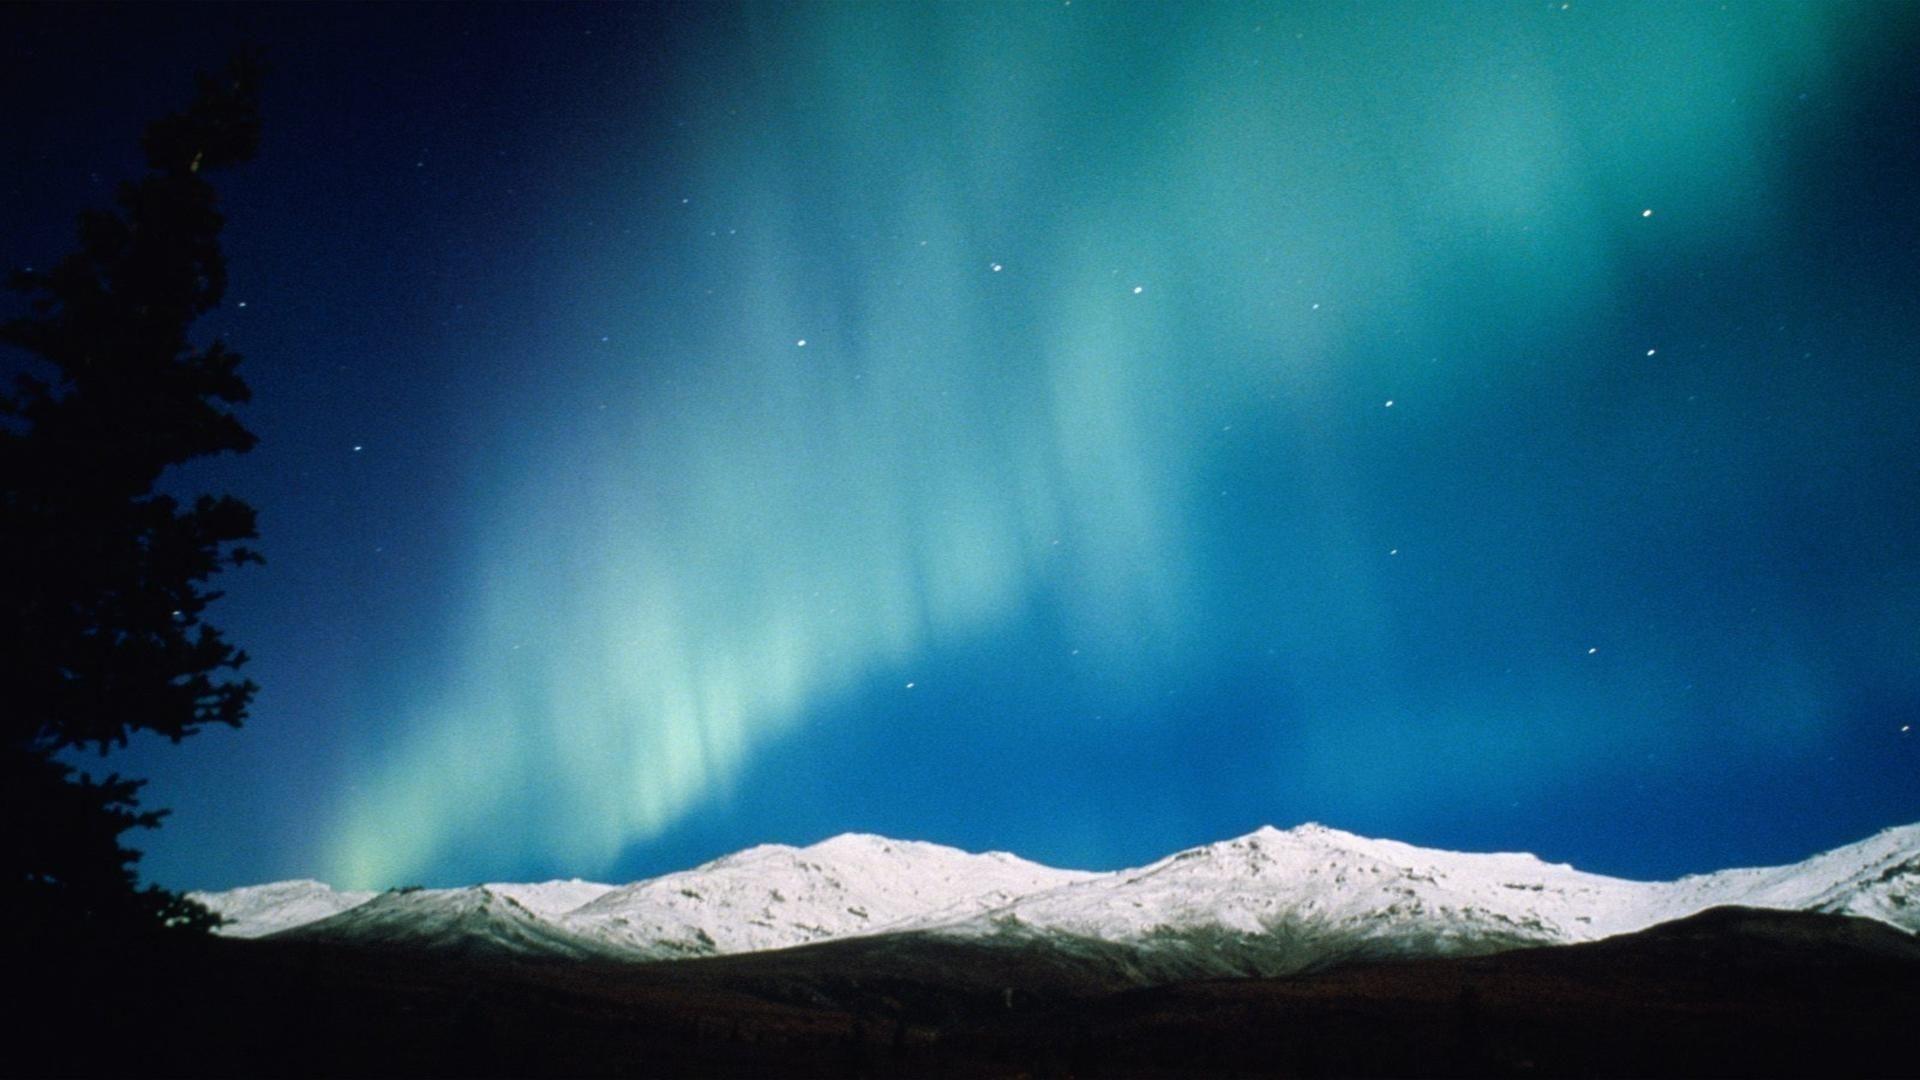 Real Northern Lights Wallpaper wallpaper. 1920×1080